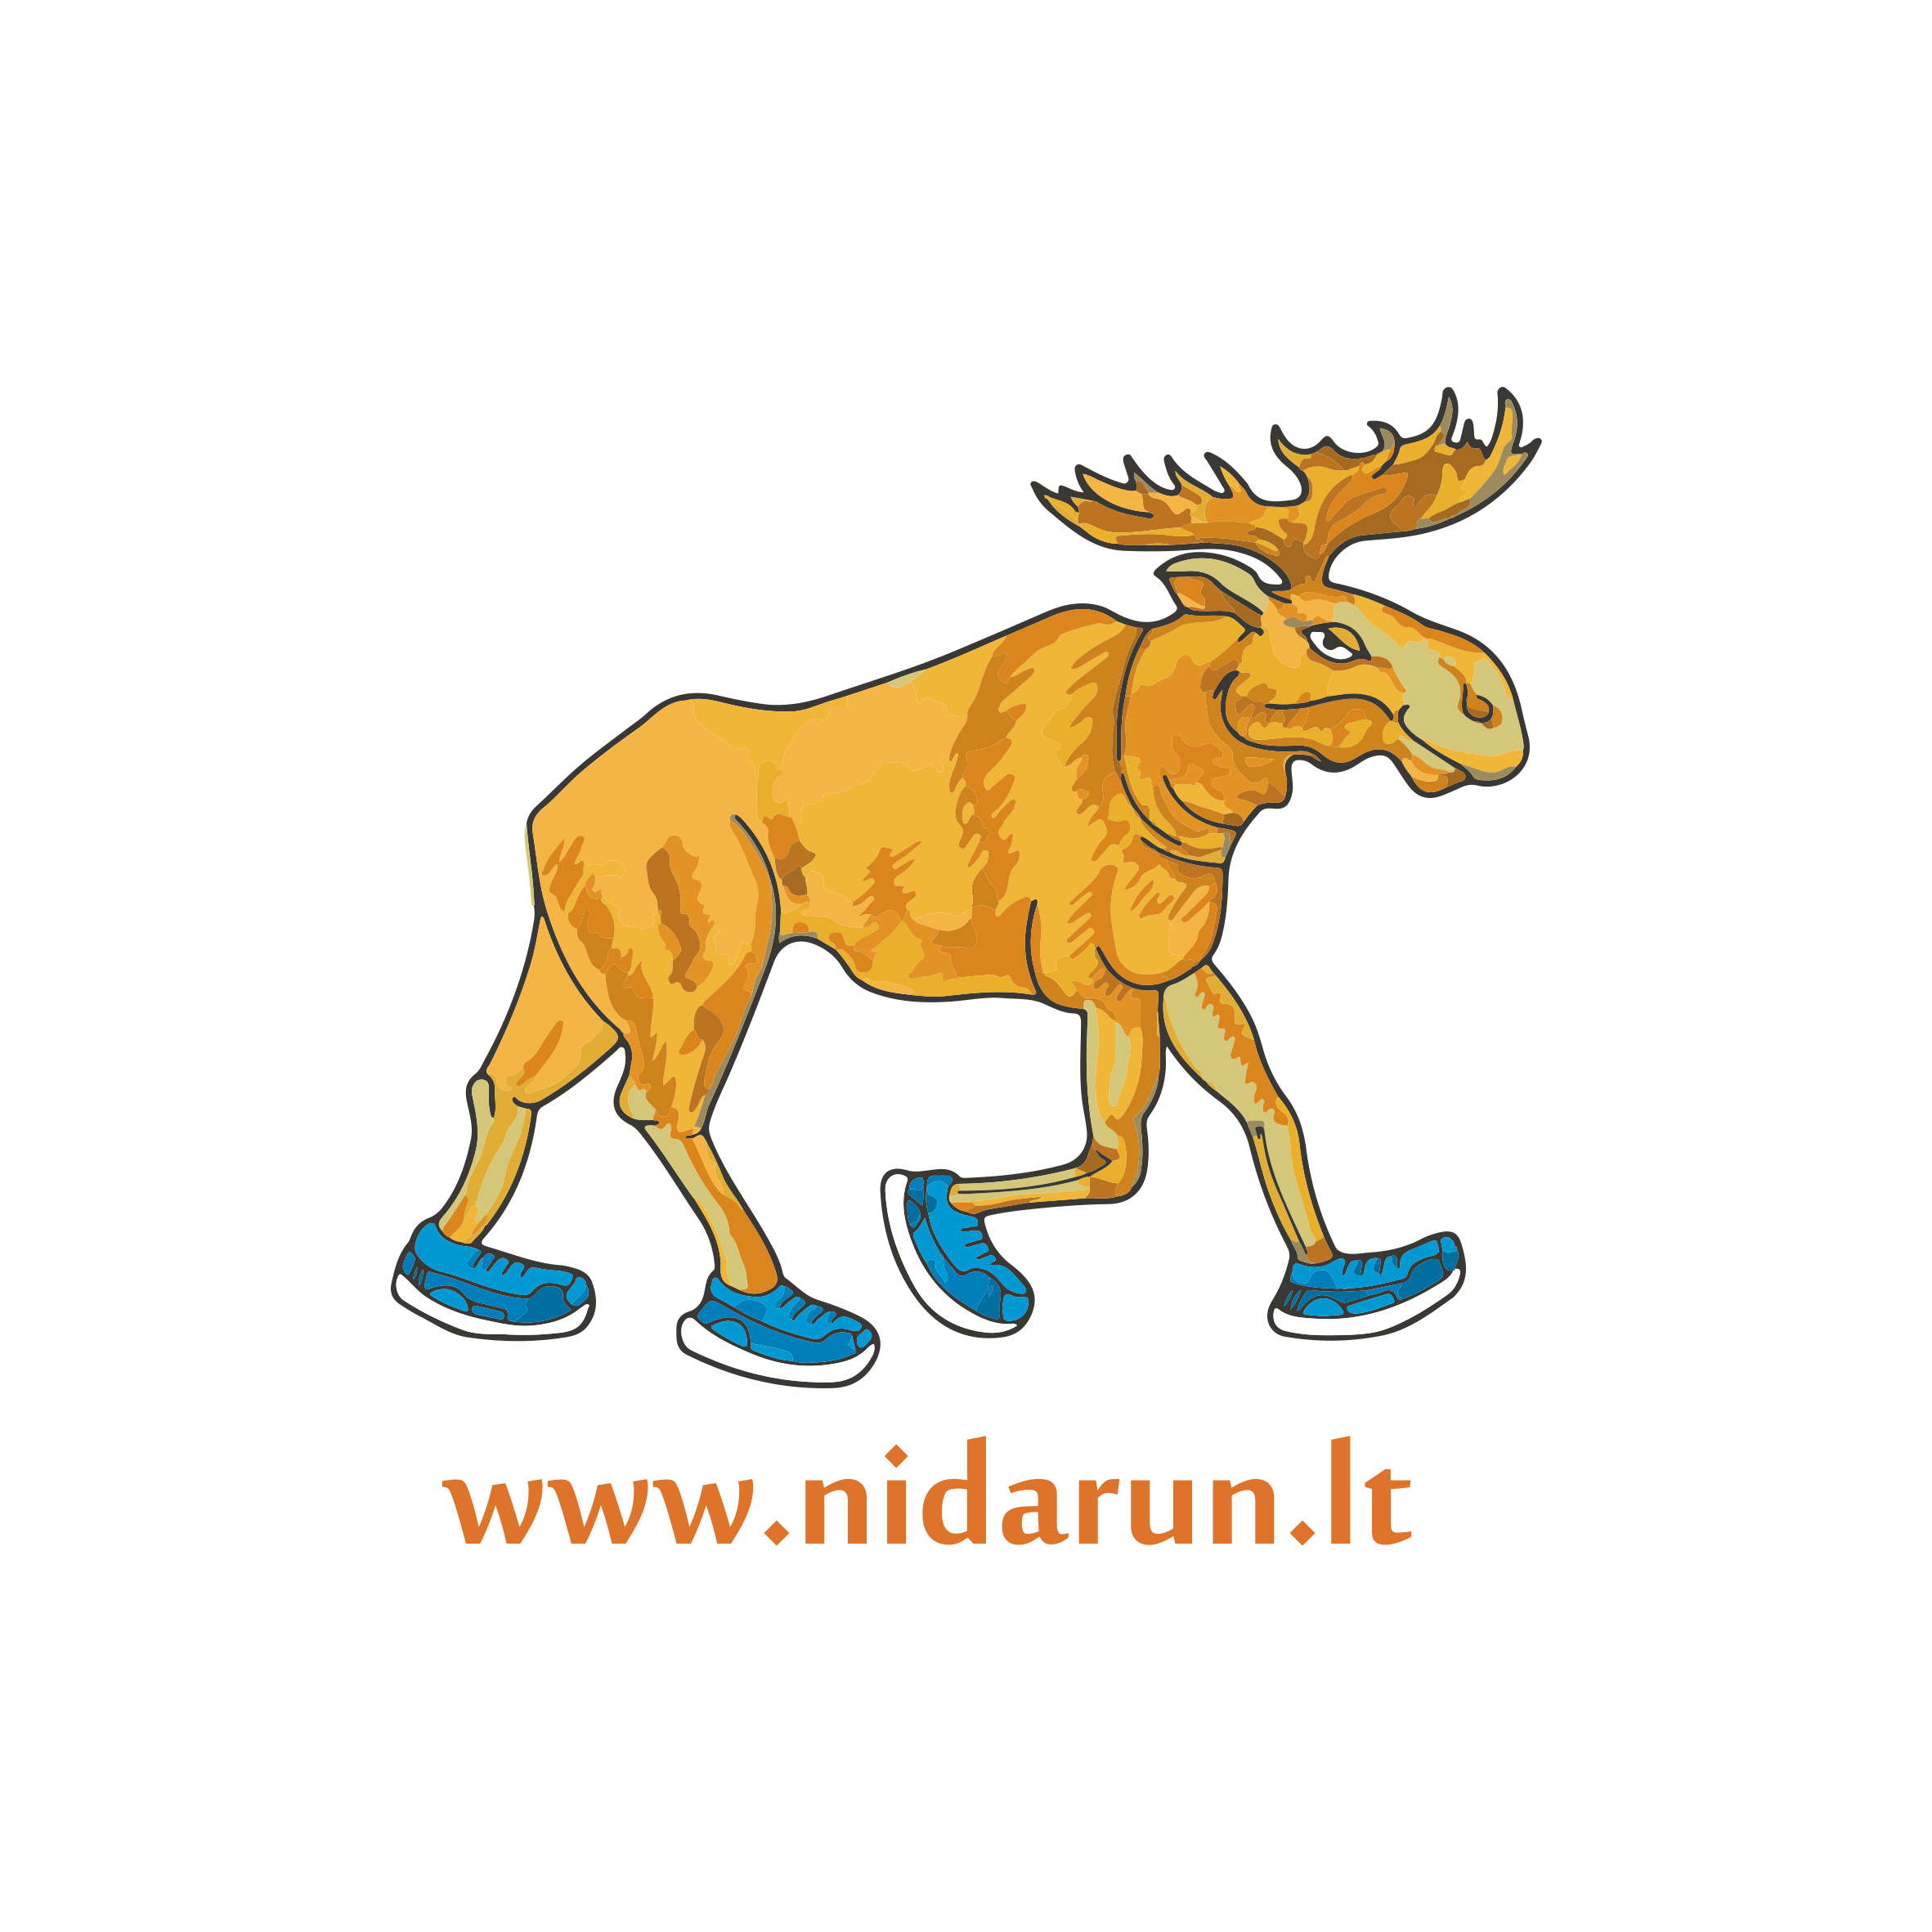 nidarun for squarespace.png